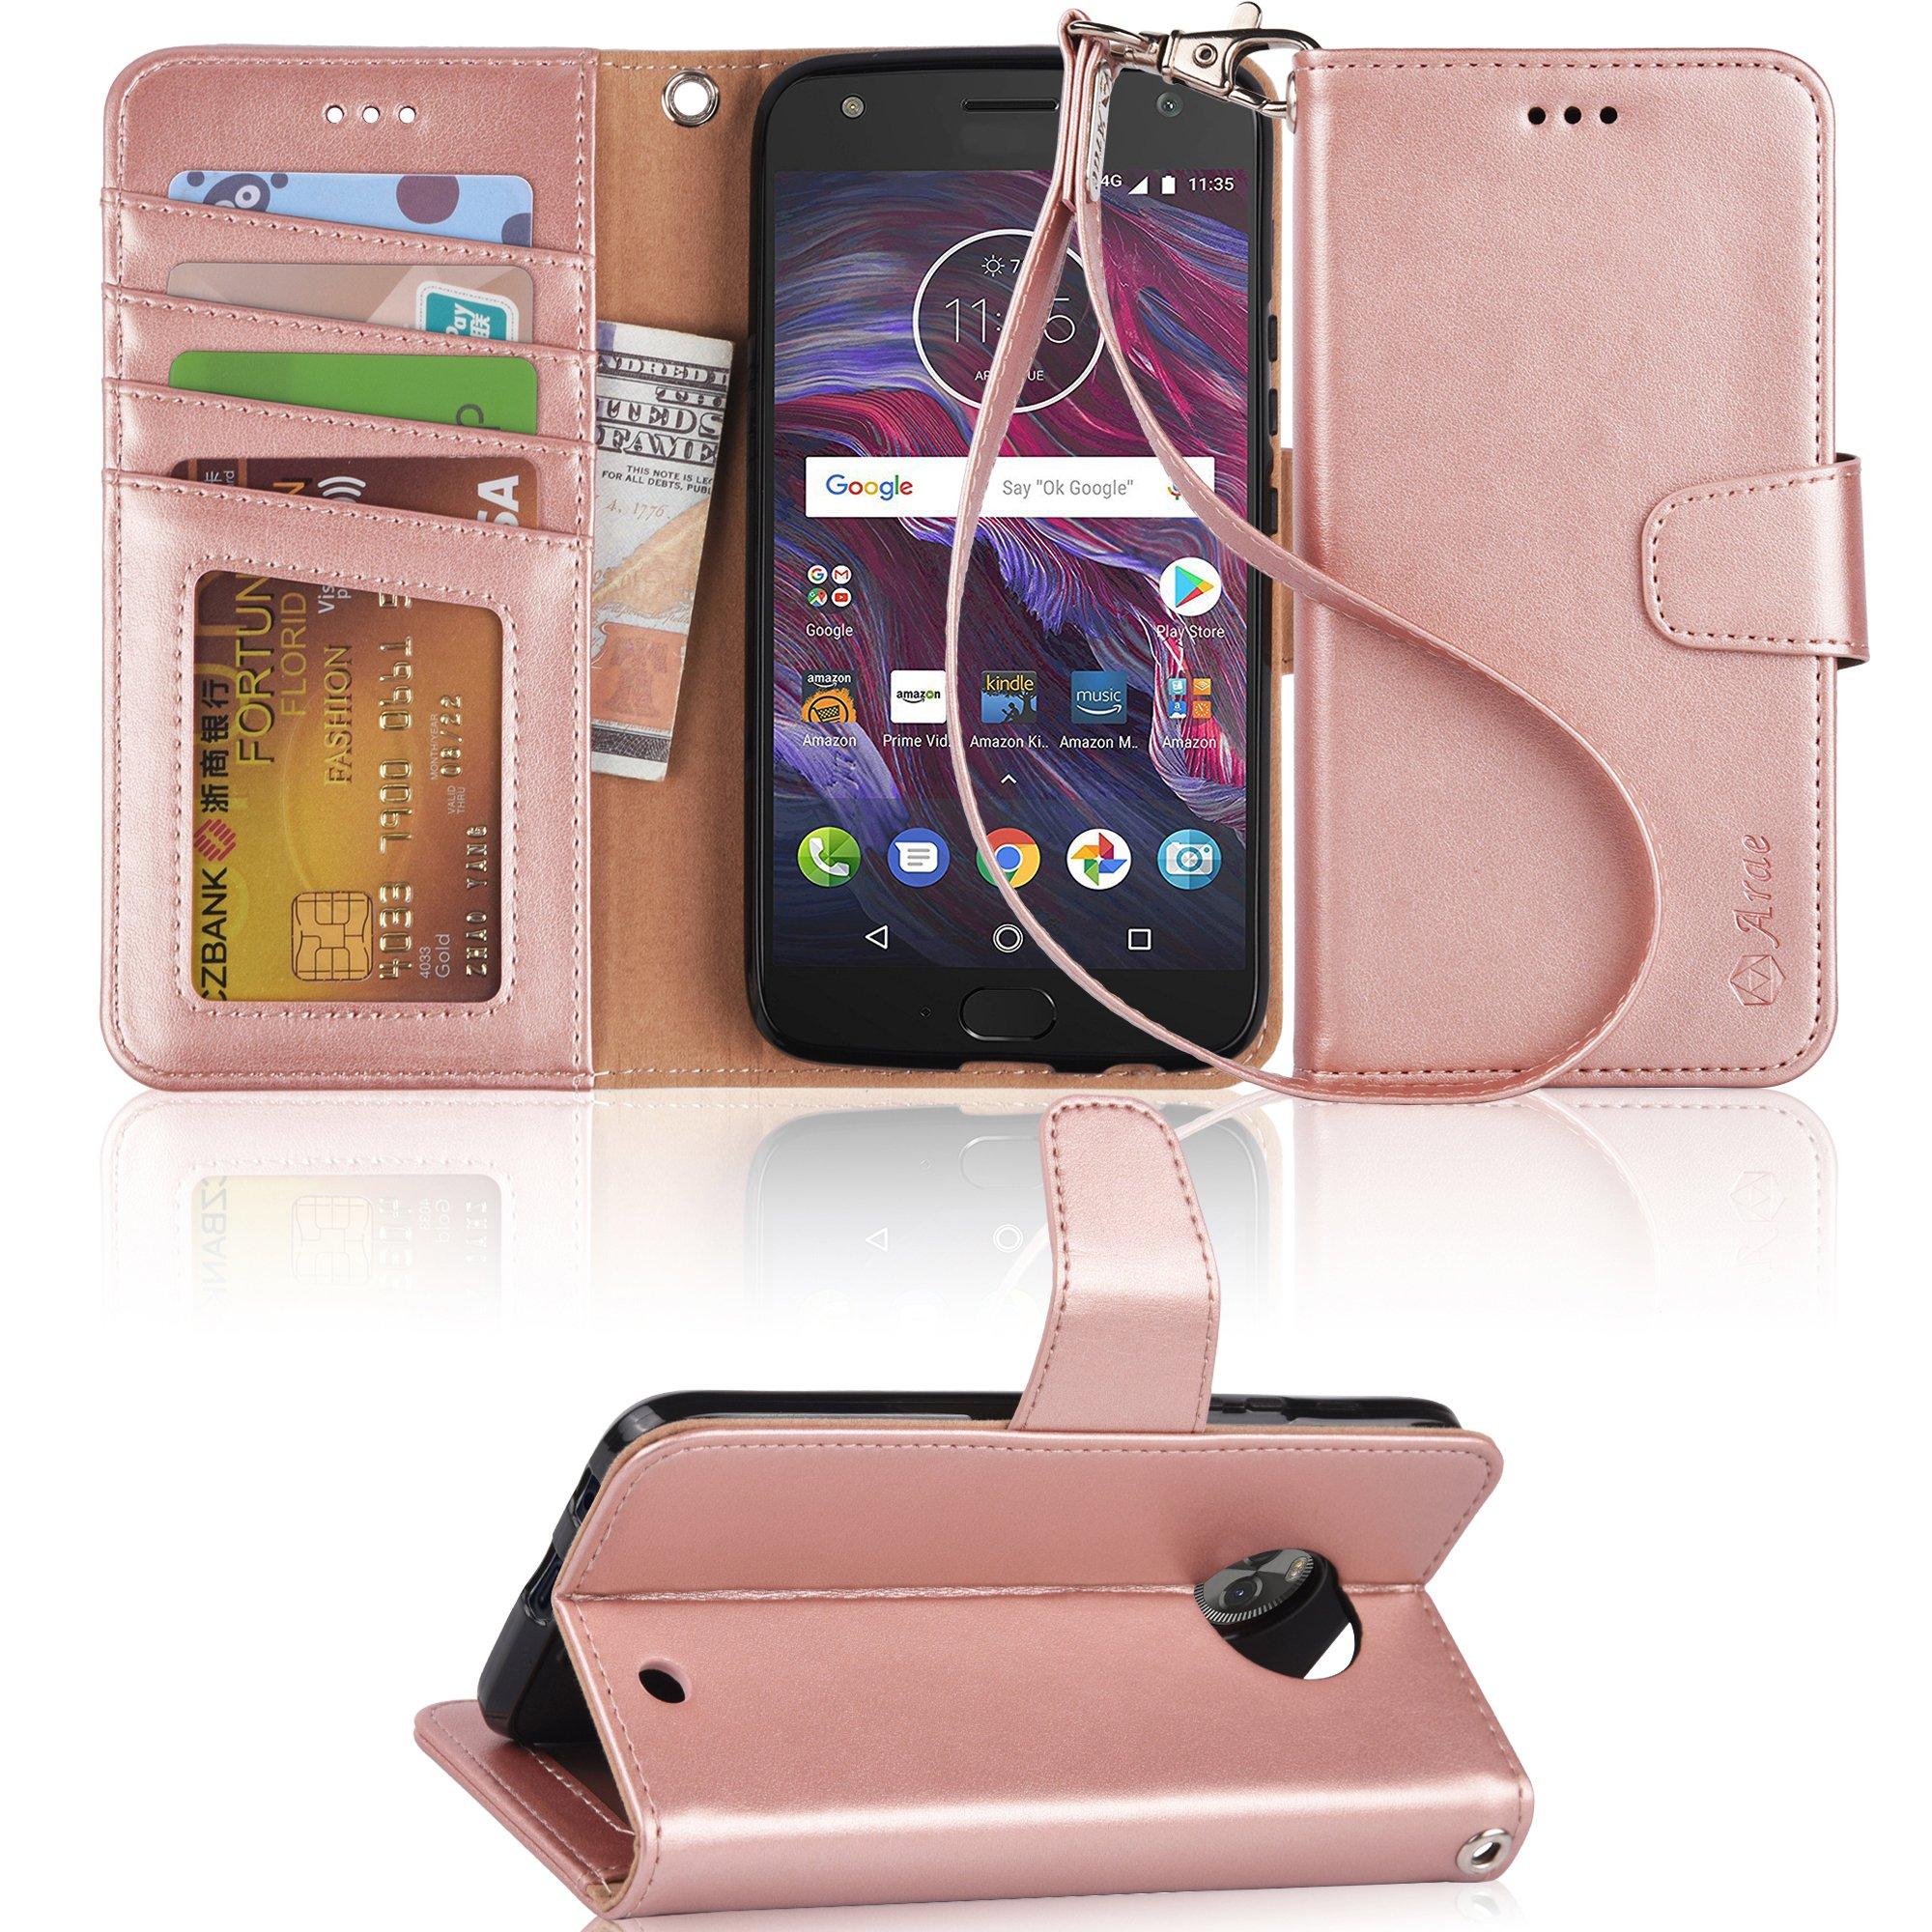 Moto X4 Case, Arae Flip Folio [Kickstand Feature] PU Leather Wallet case [4 Slot] ID&Credit Cards Pocket Moto X4 - Rose Gold